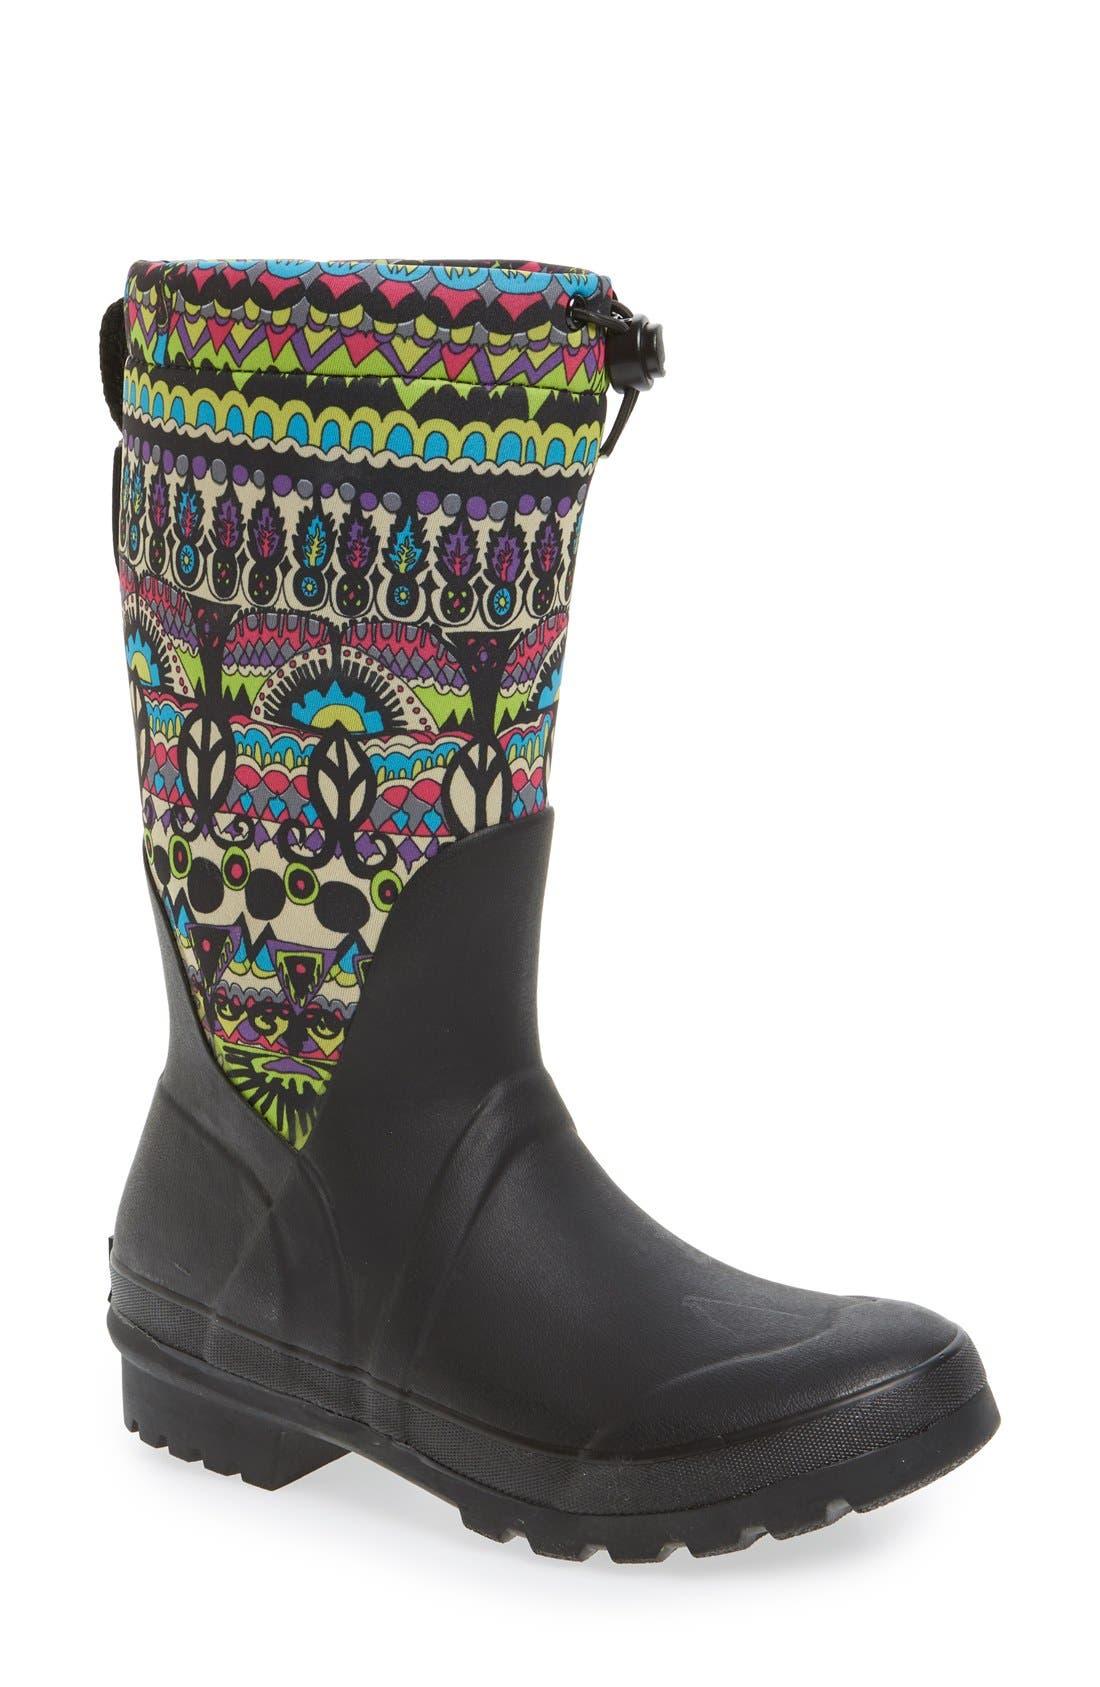 Alternate Image 1 Selected - Sakroots 'Mezzo' Waterproof Rain Boot (Women)